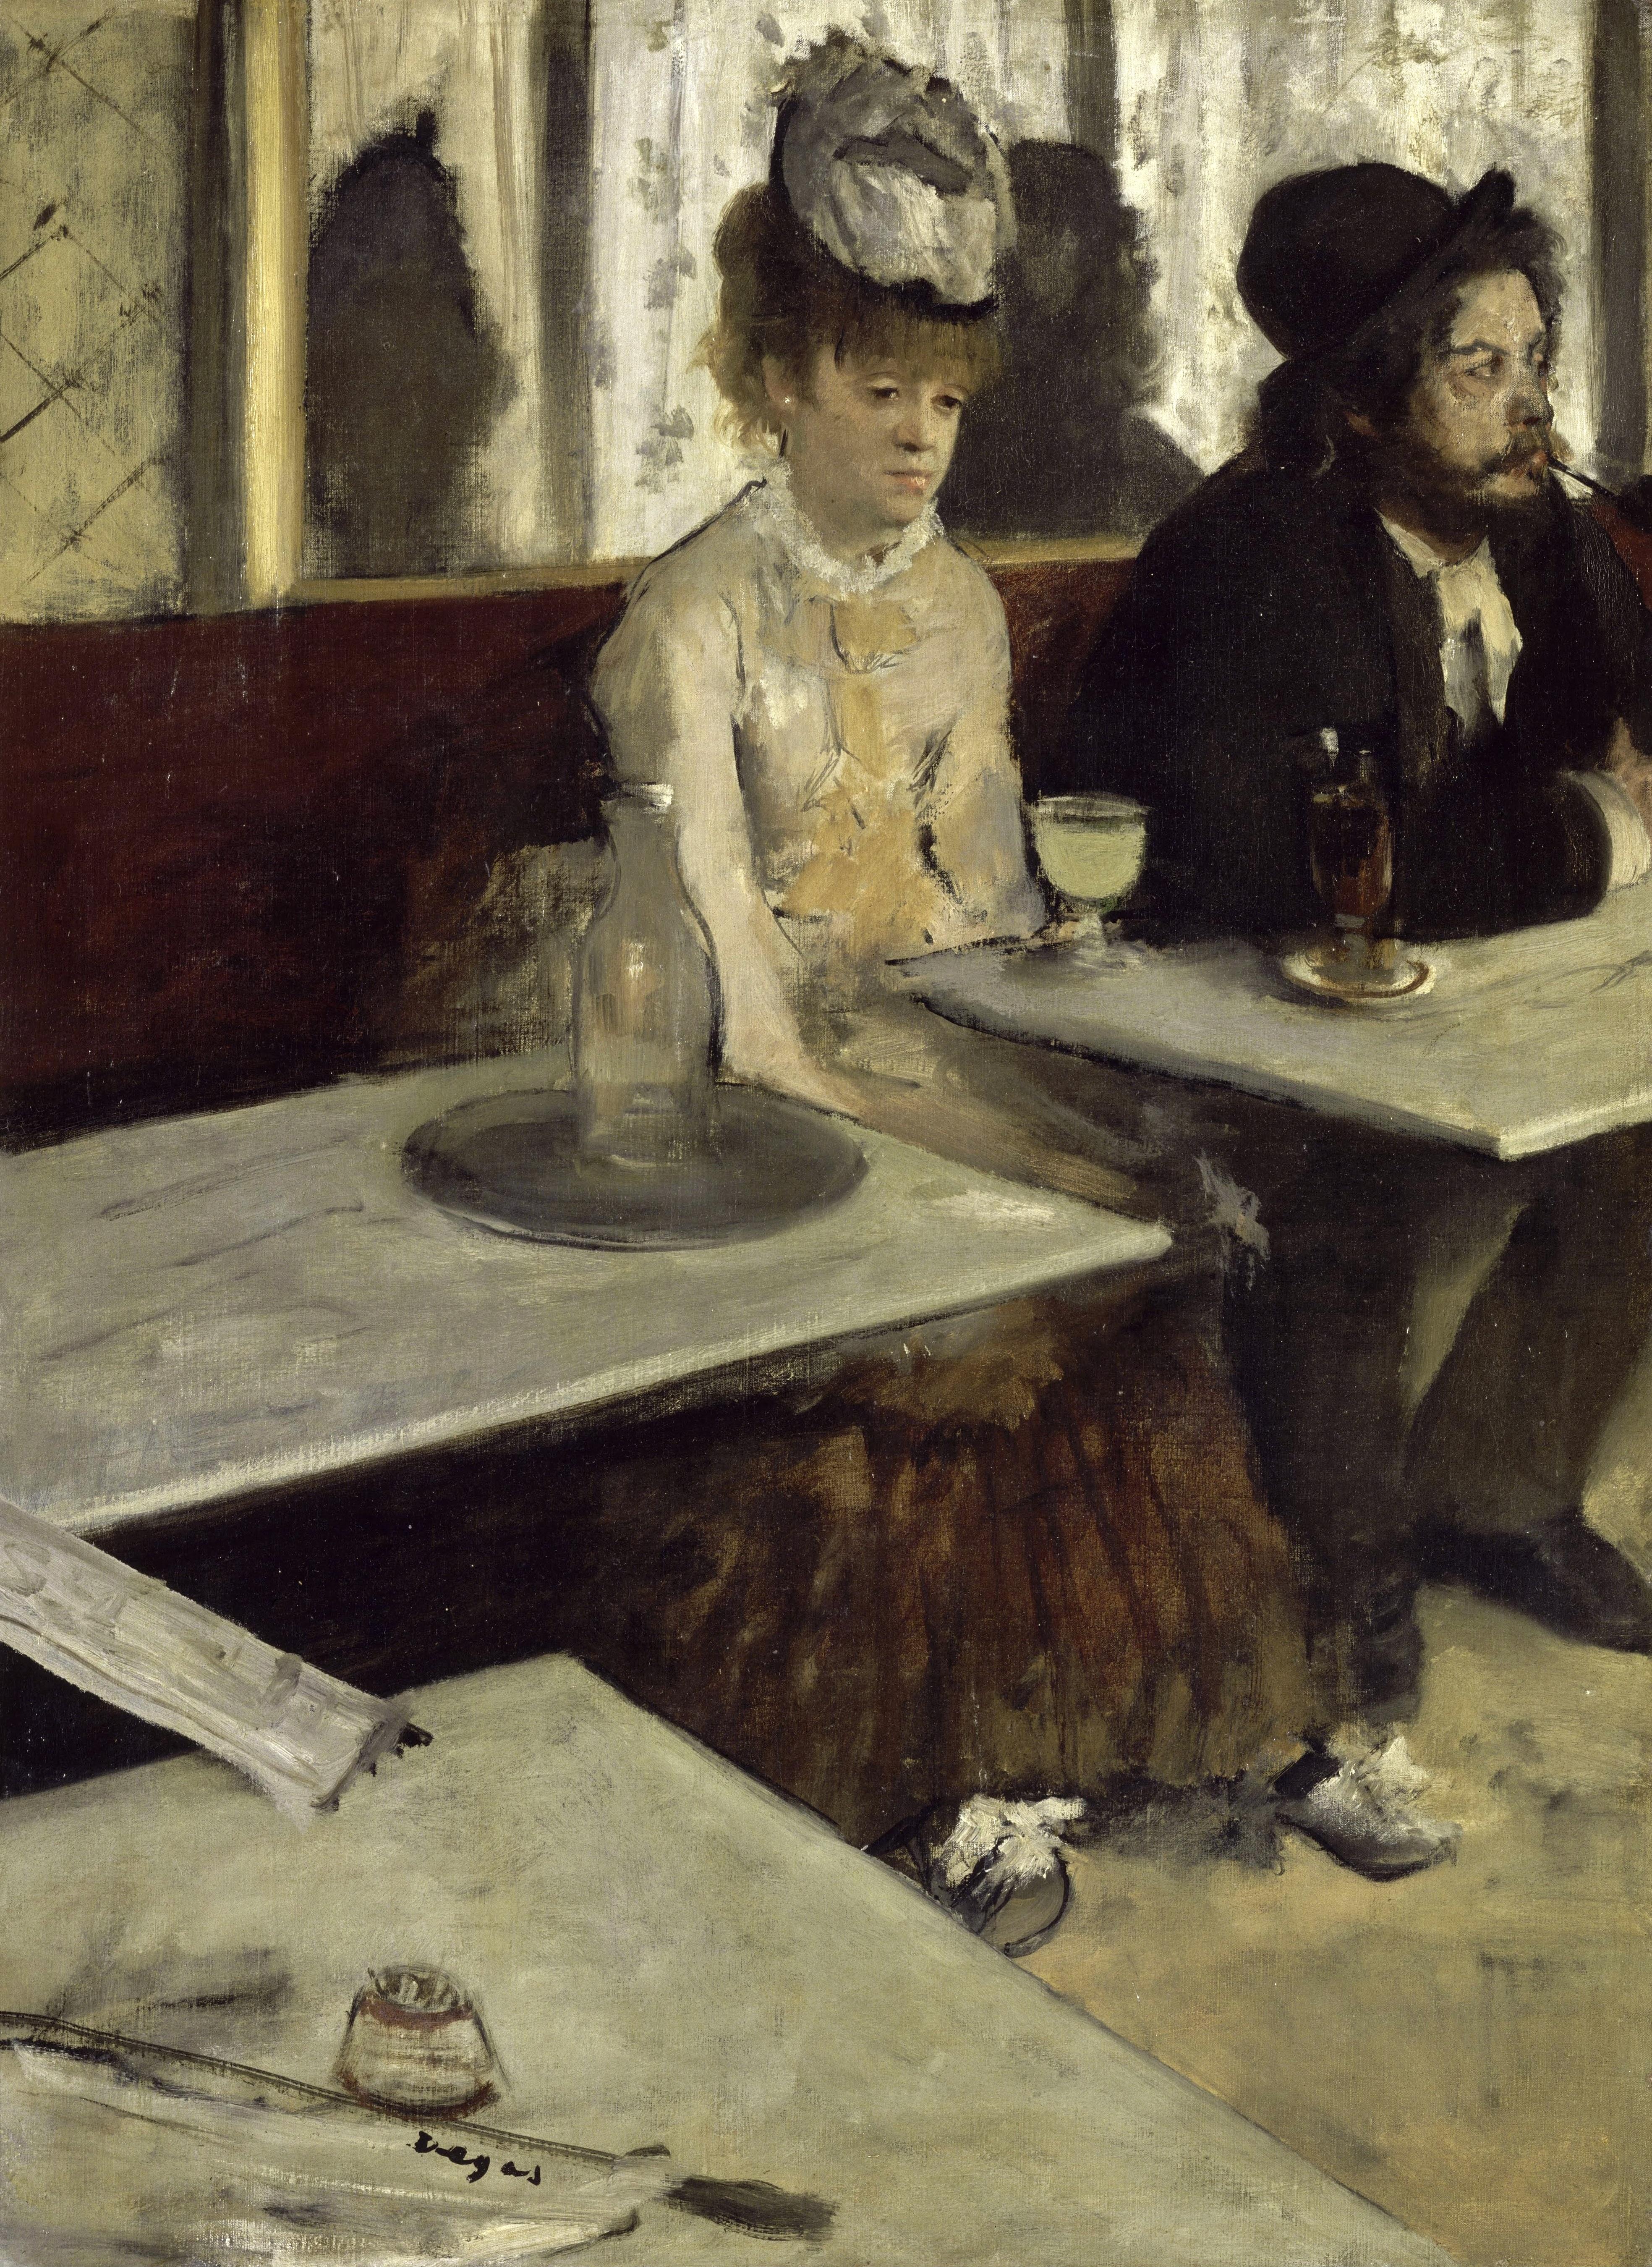 Edgar_Degas_-_In_a_Caf%C3%A9_-_Google_Ar